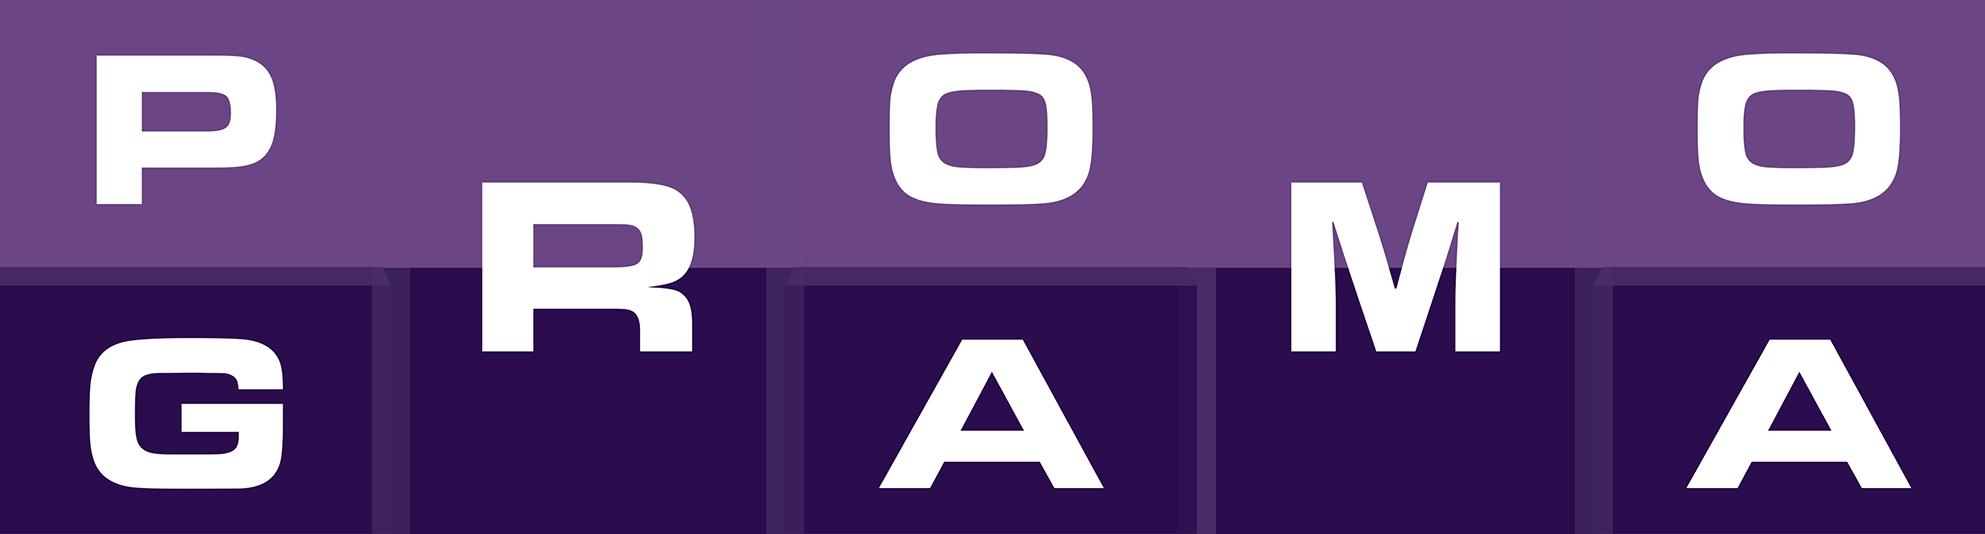 Promograma Digital Signage